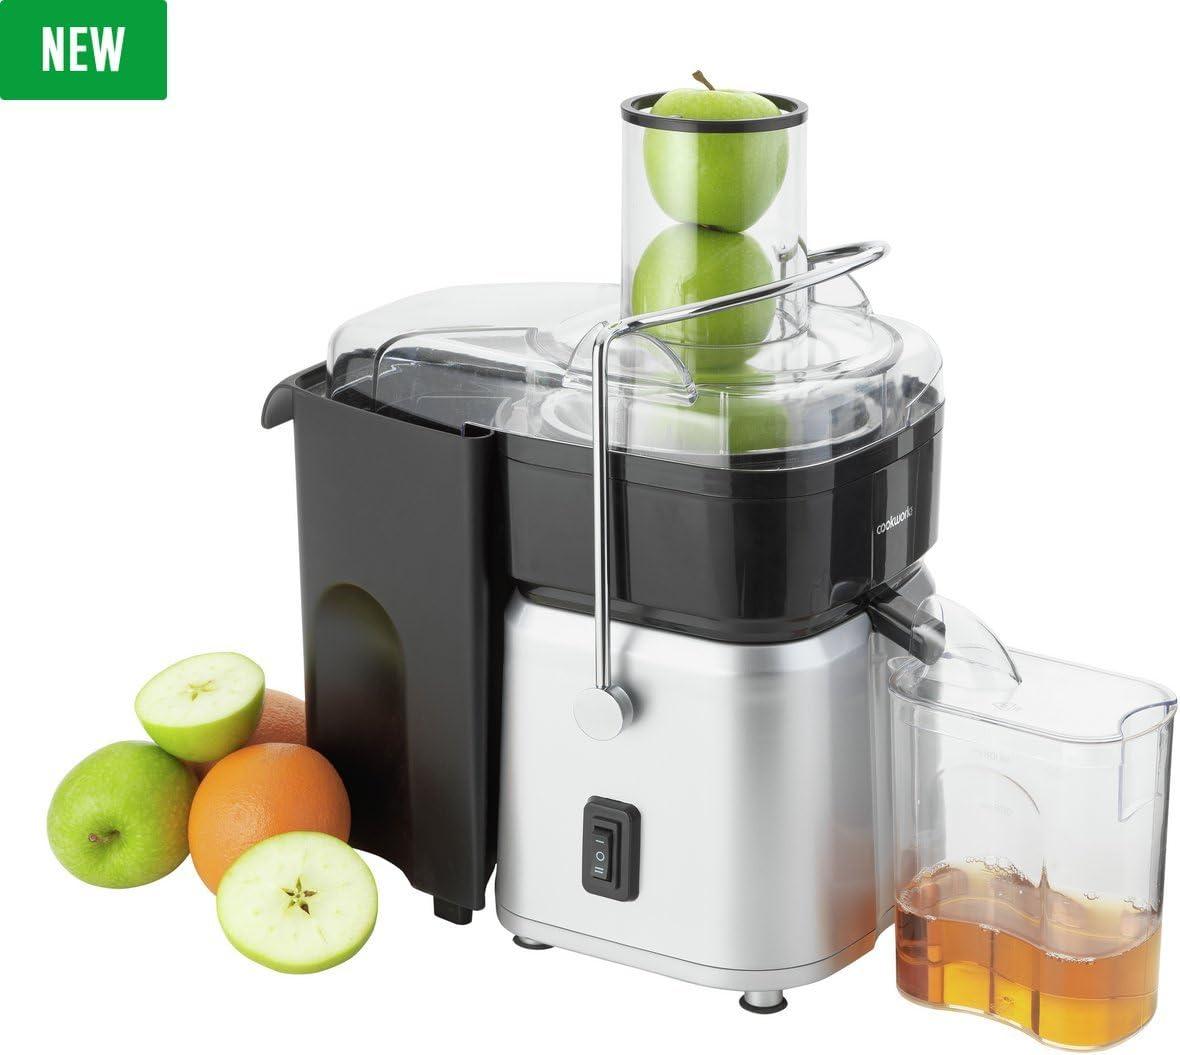 Cookworks Whole 700 Watts Fruit Juicer StSteeL